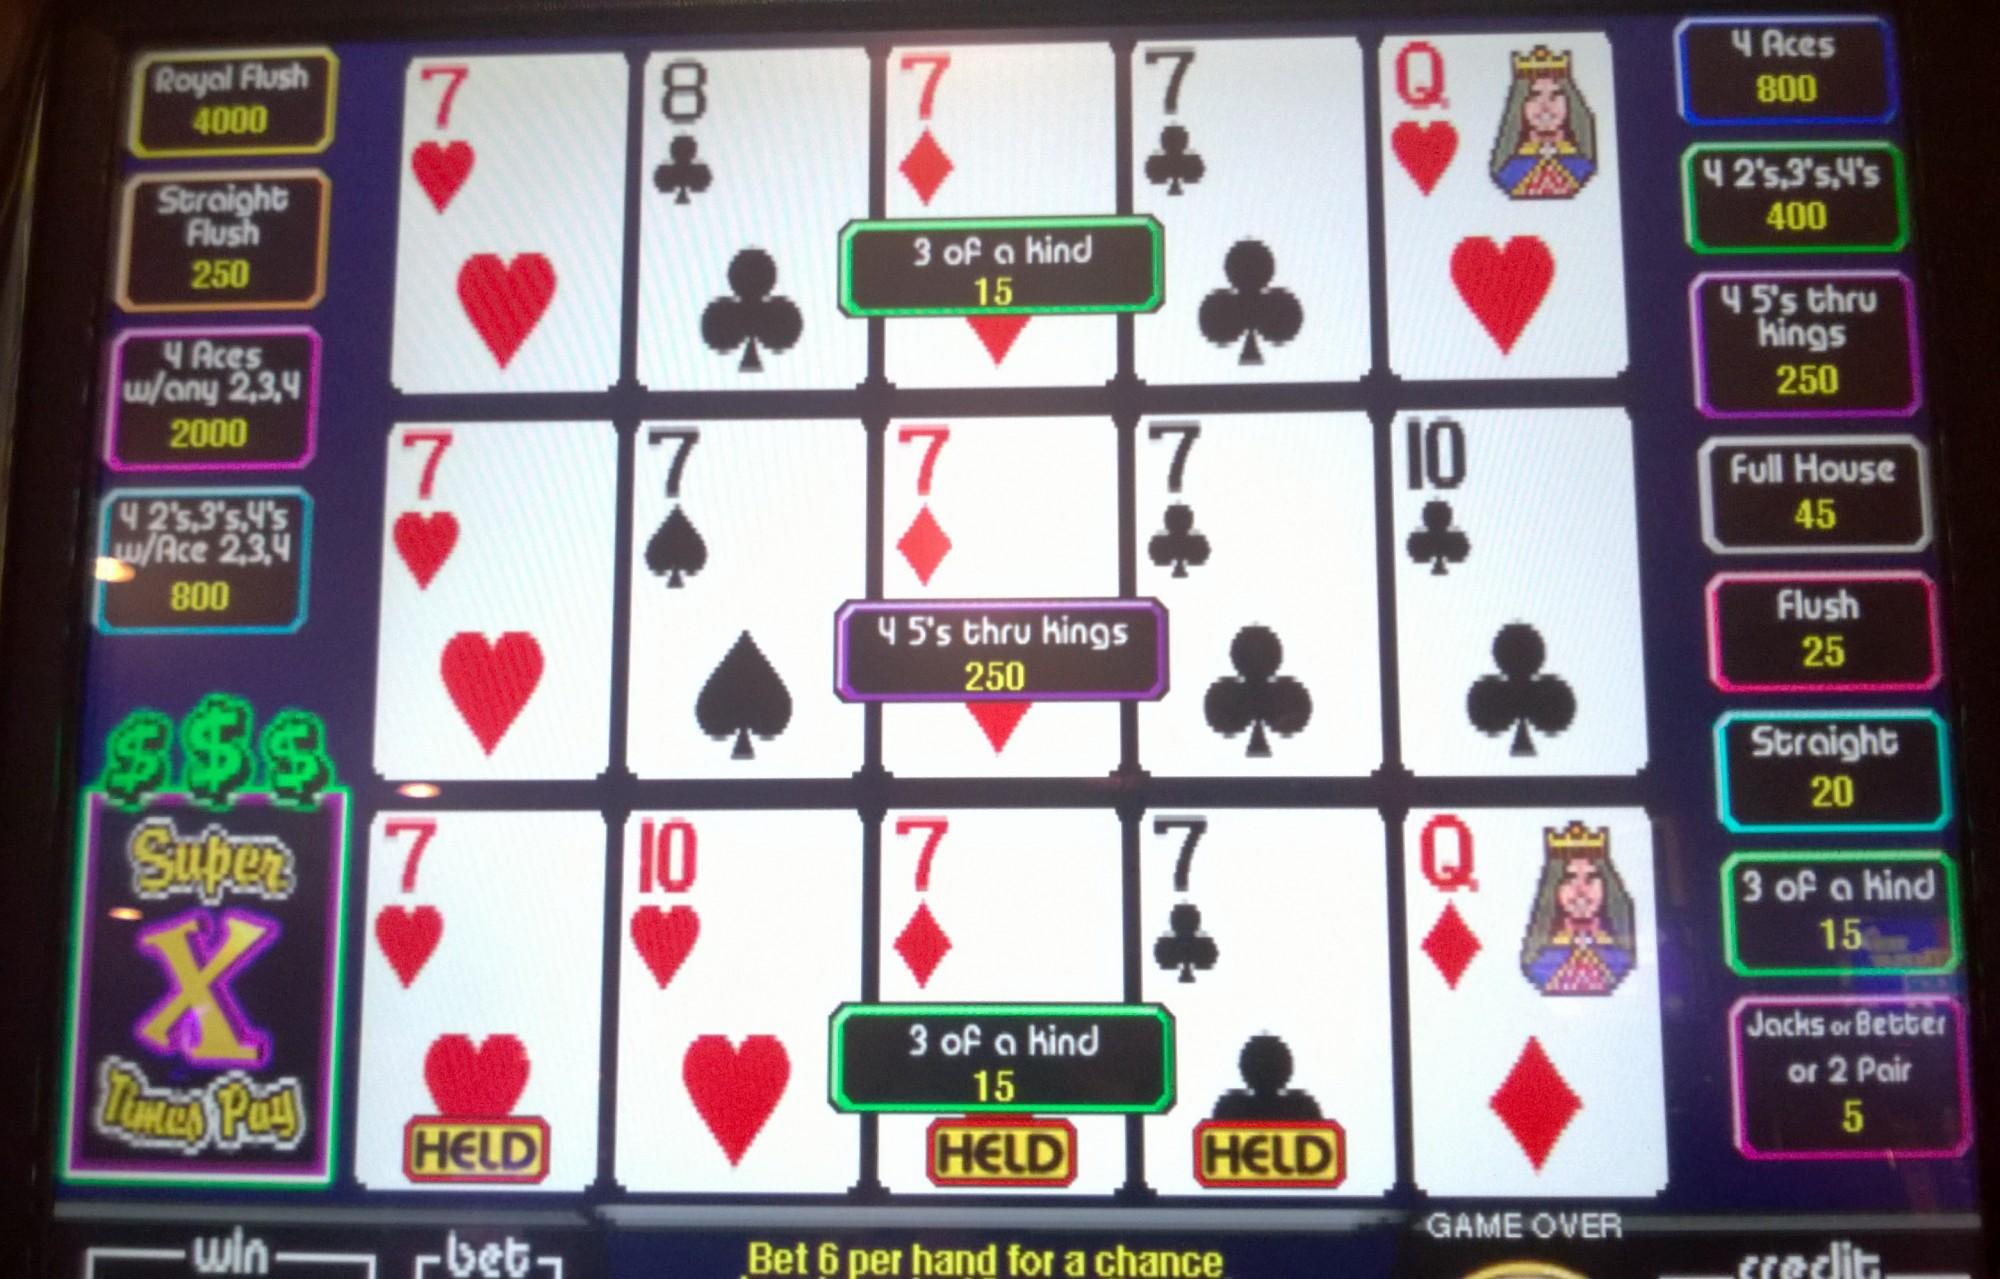 Host blackjack online